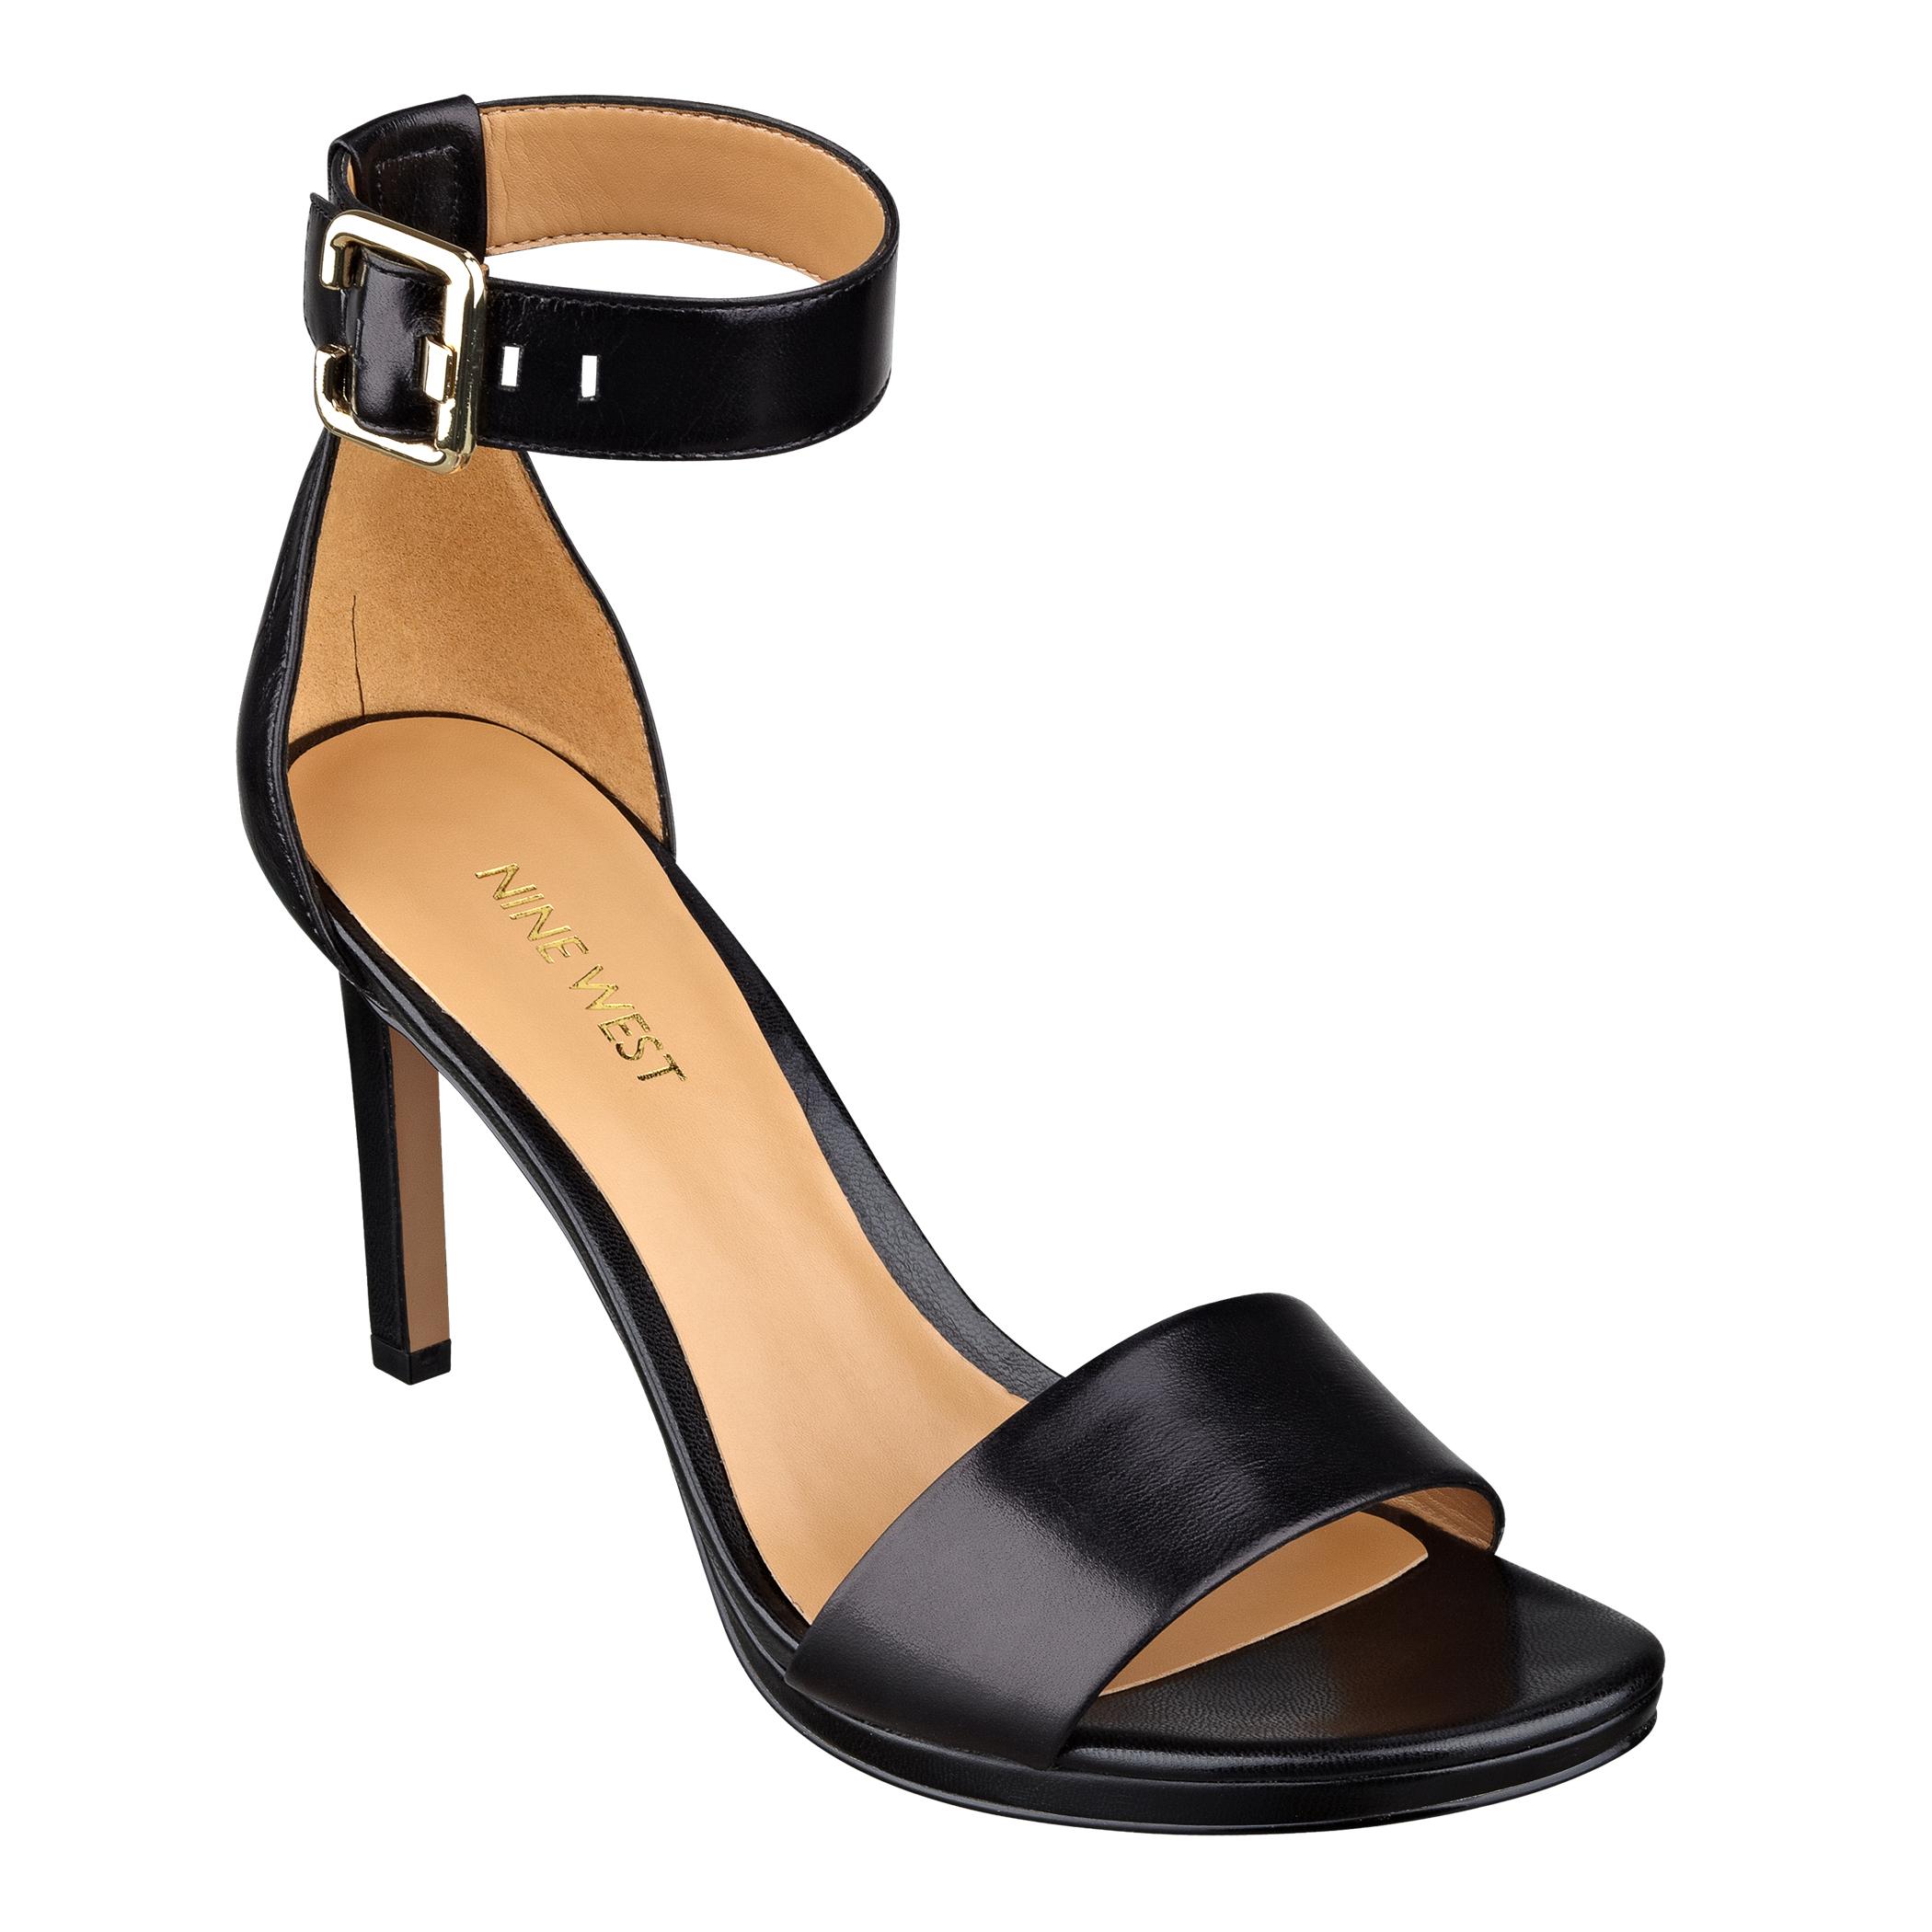 nine west meantobe platform sandals in black black